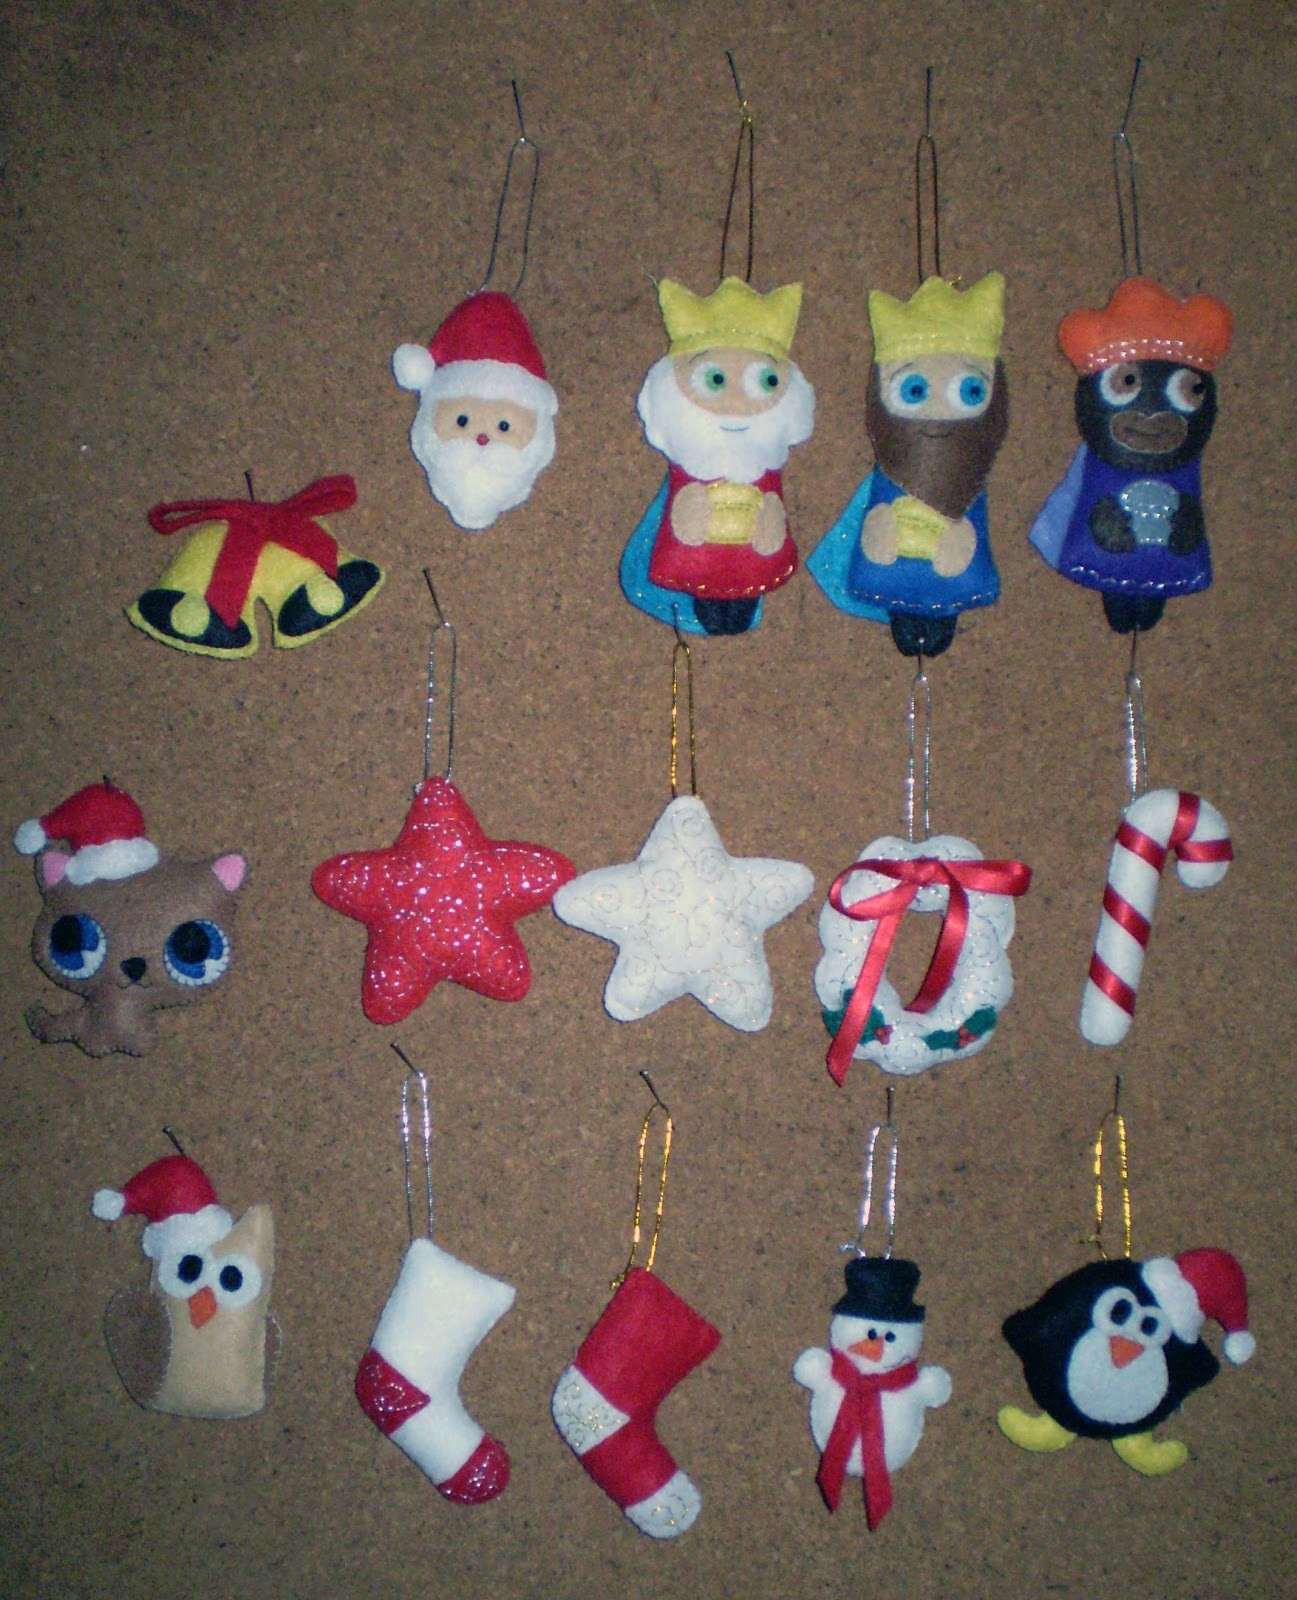 Adornos navideños fieltro - Imagui